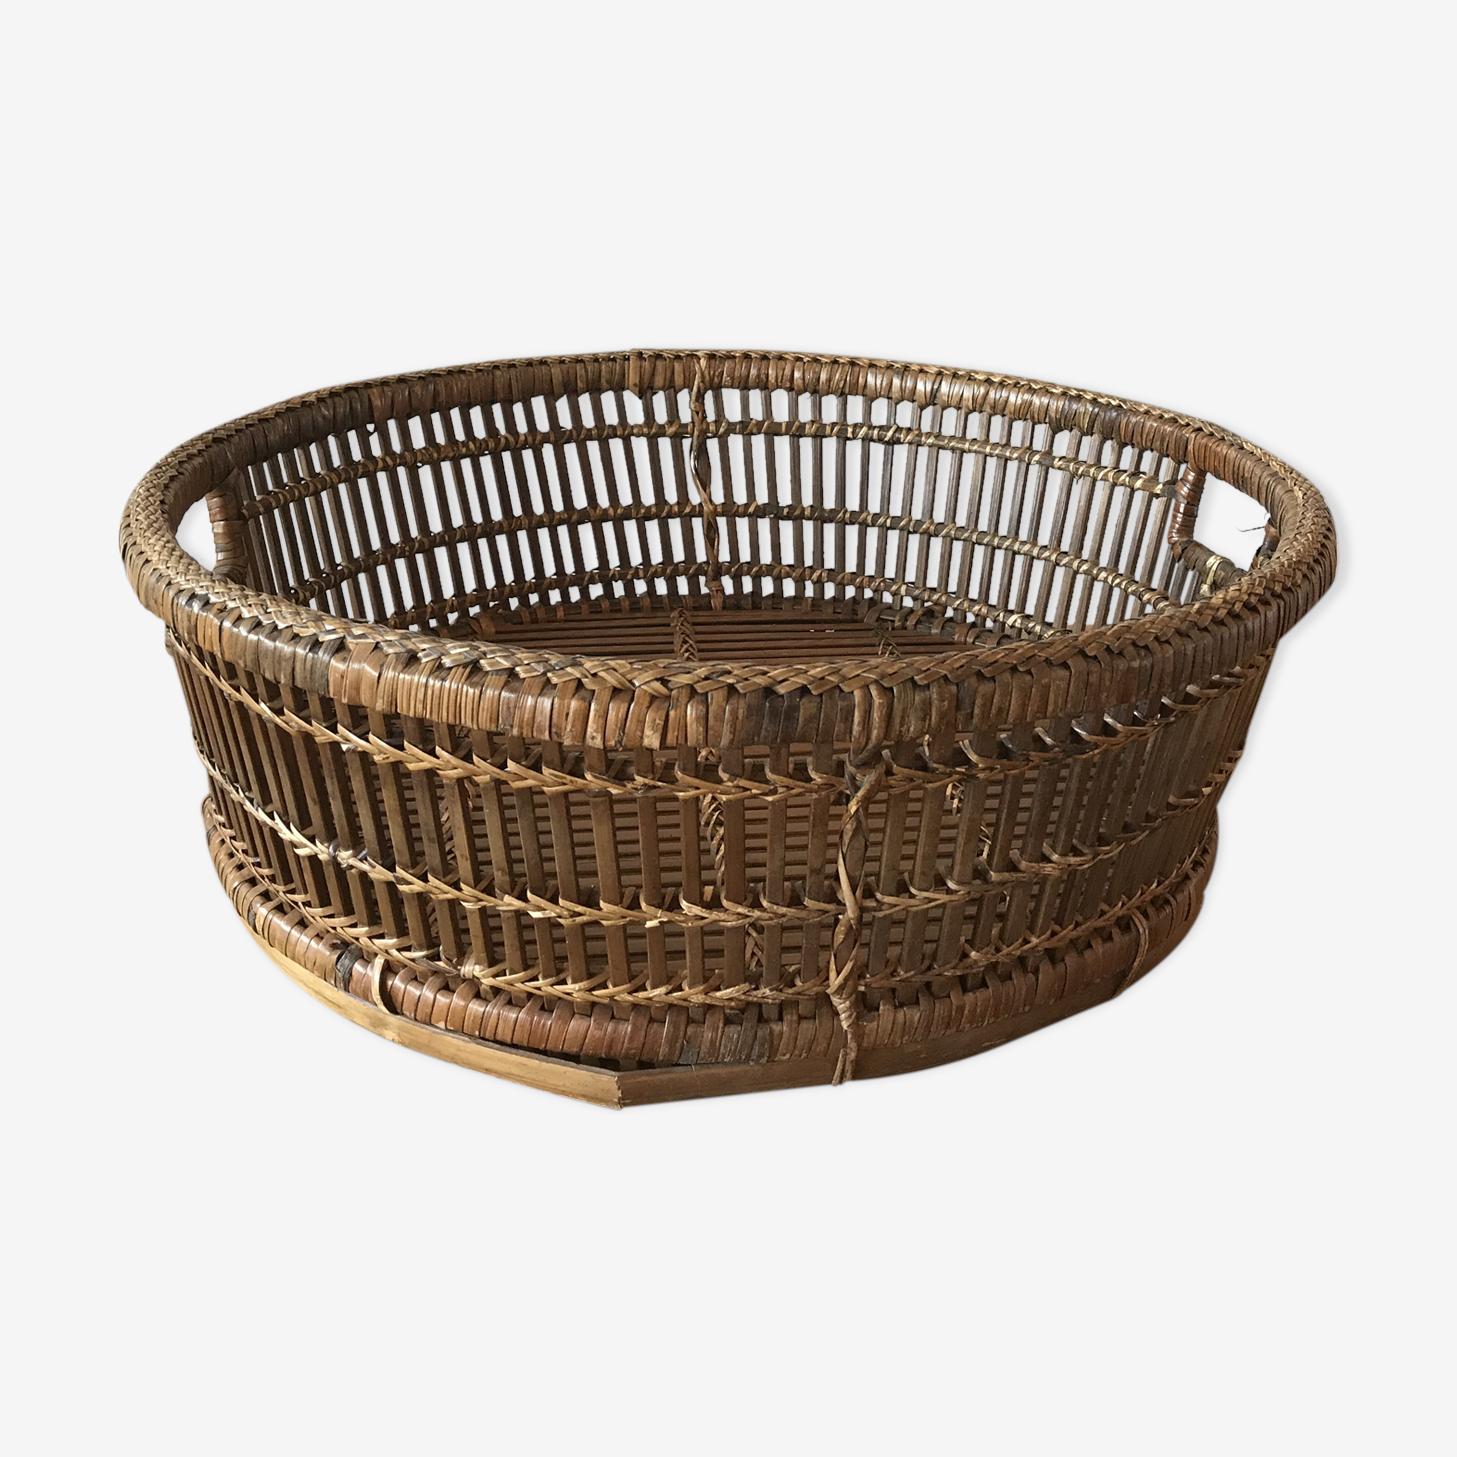 Basket rattan